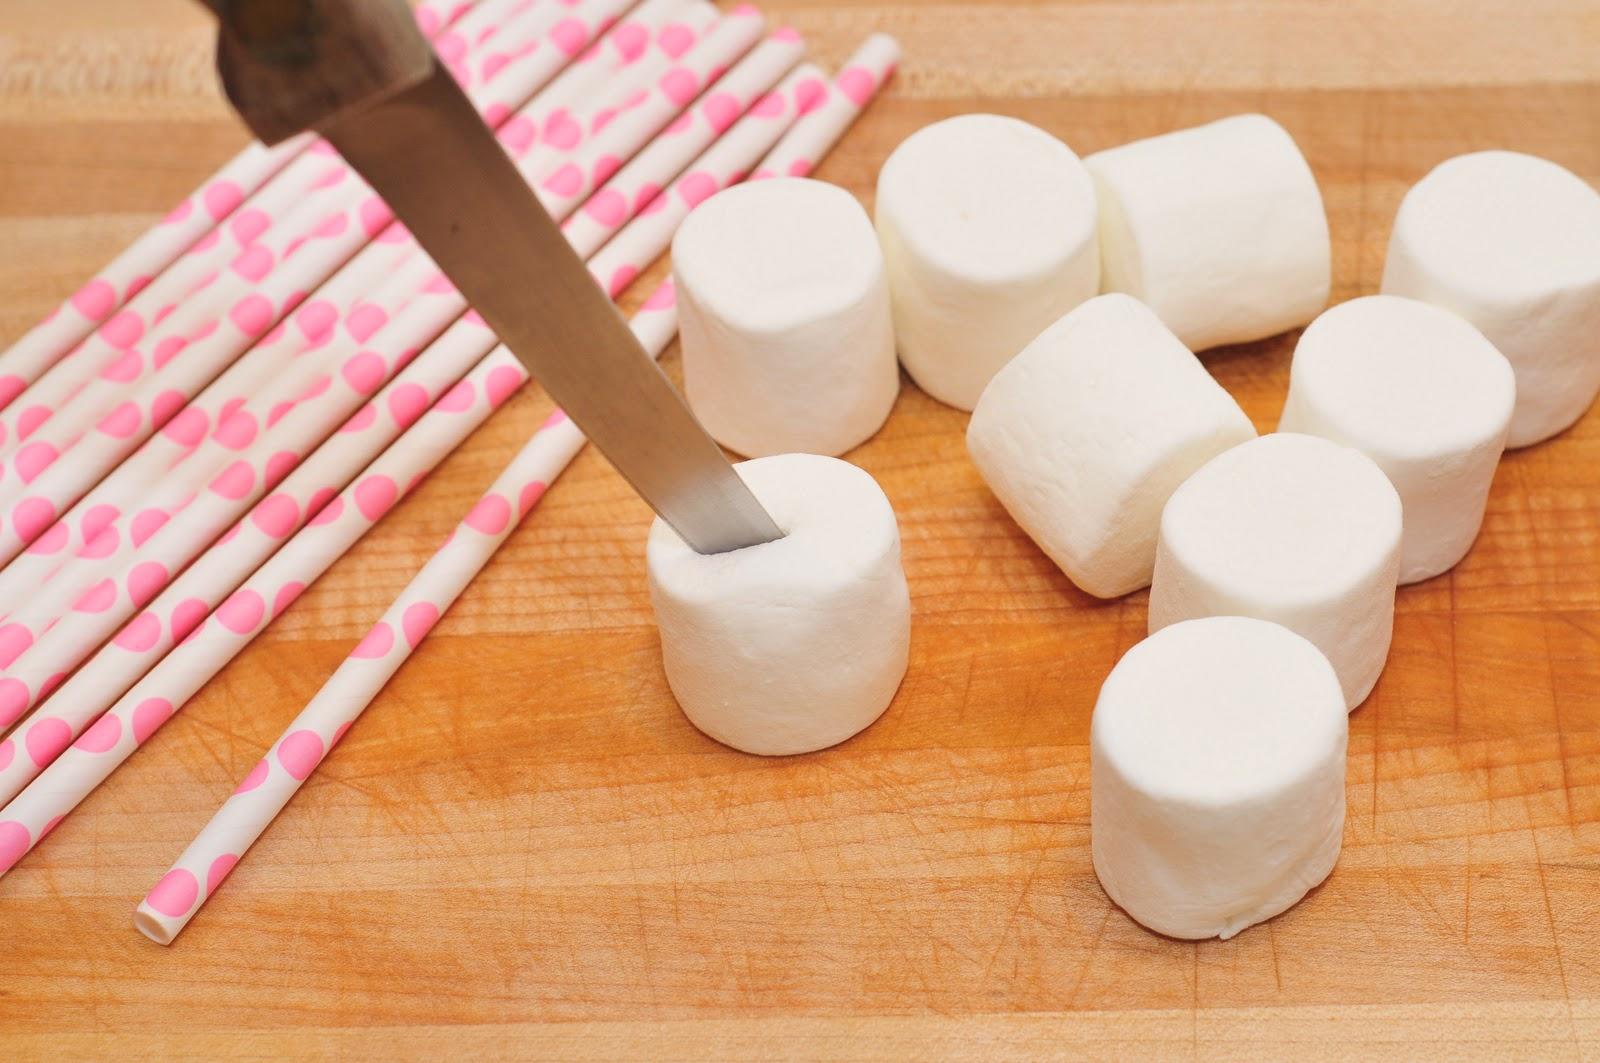 Marshmallows-Cutting Slits